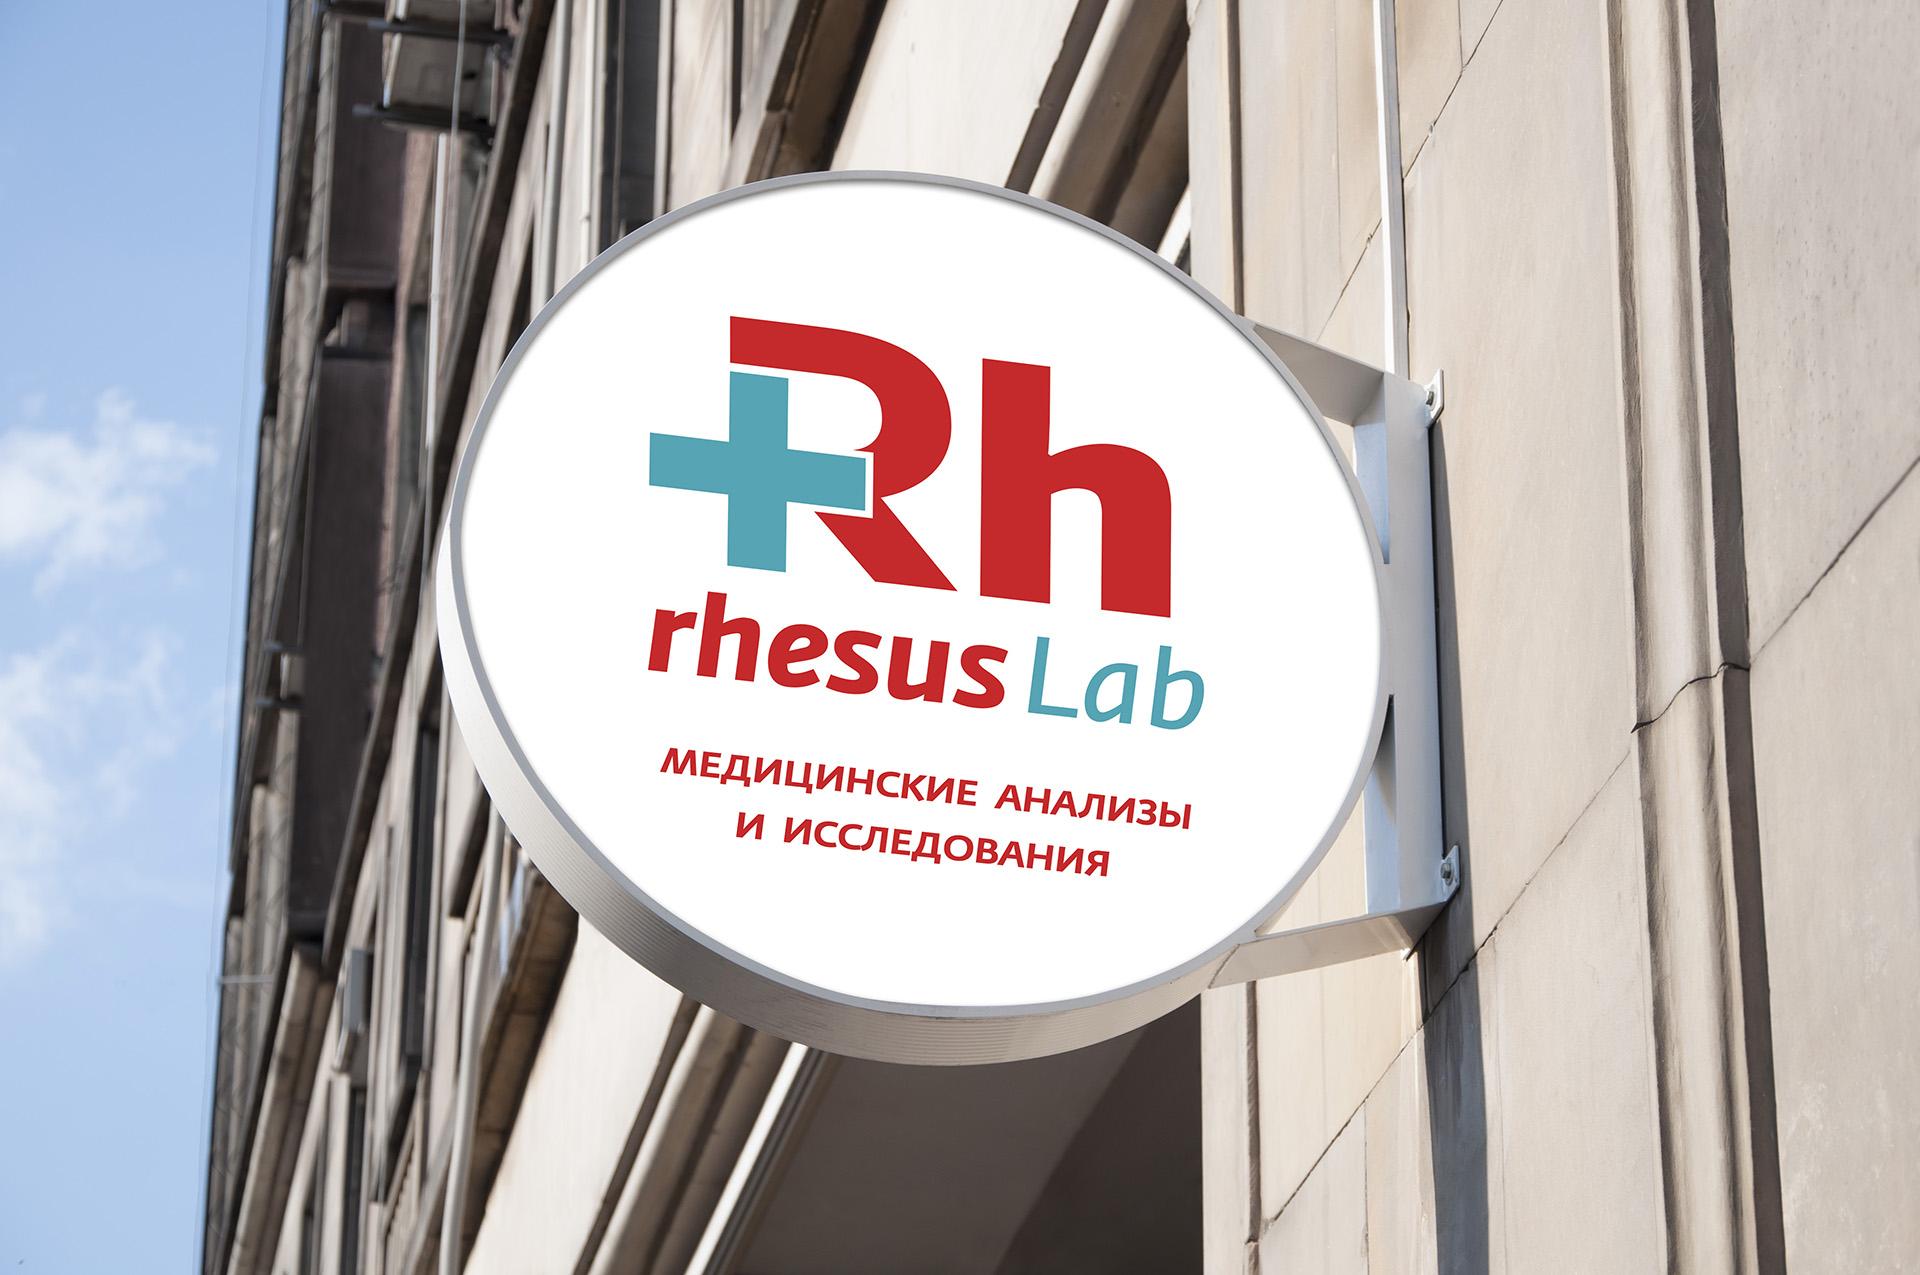 Логотип диагностического центра